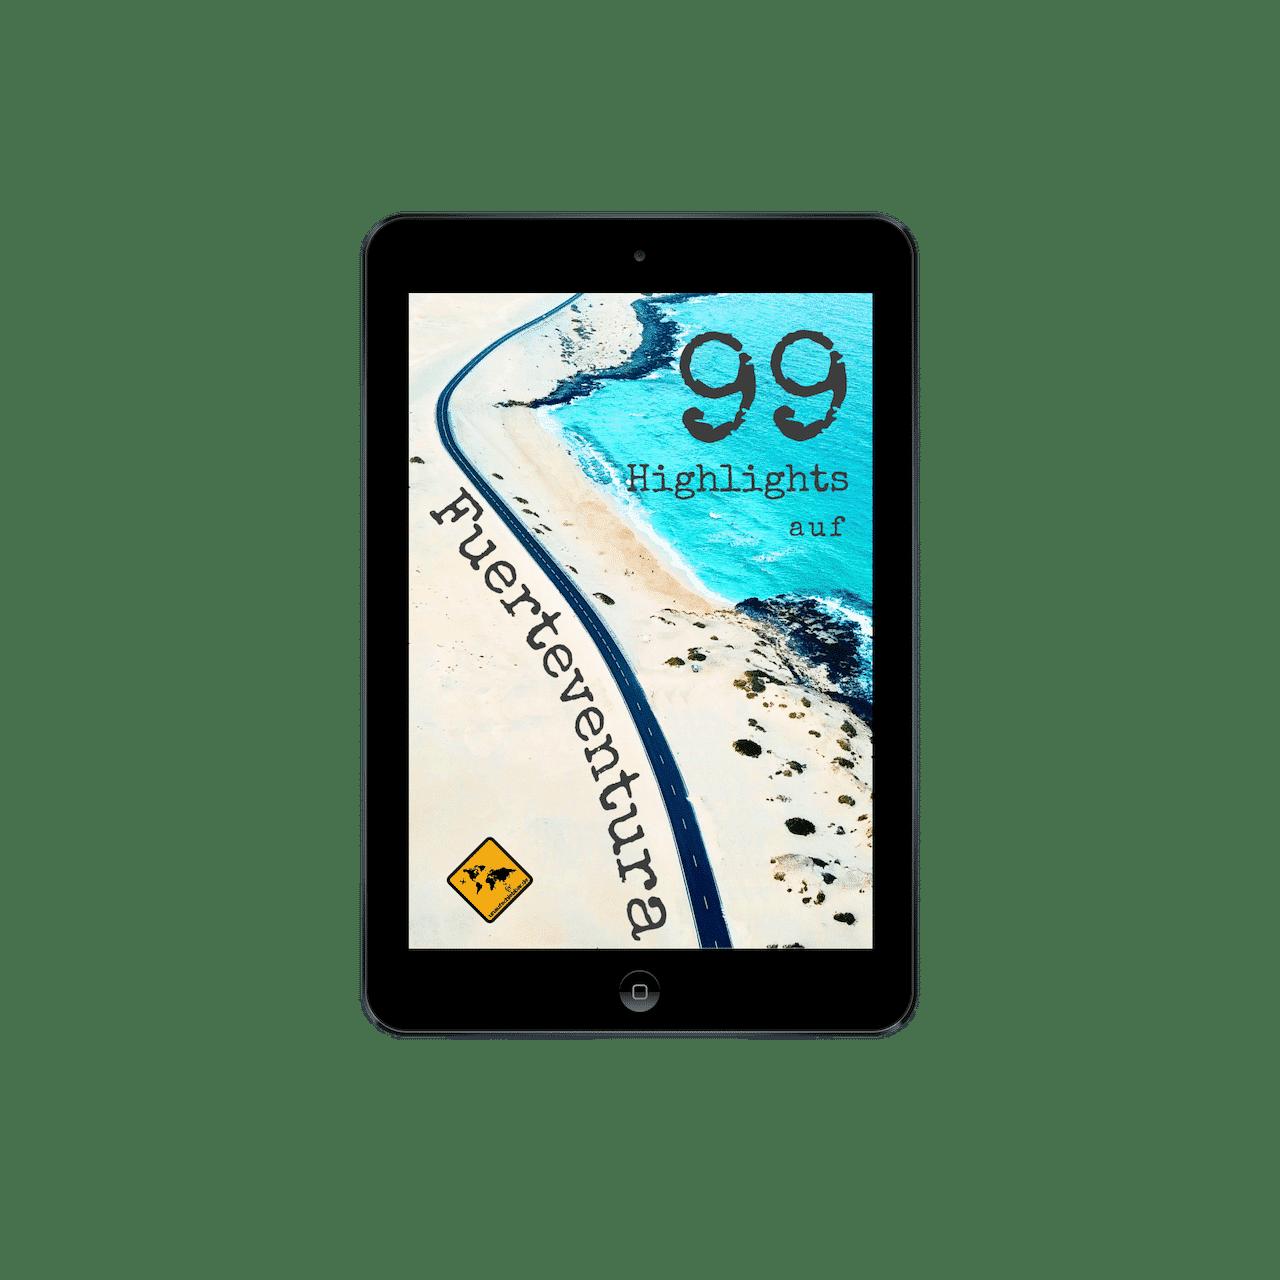 Fuerteventura Reiseführer Cover ipad